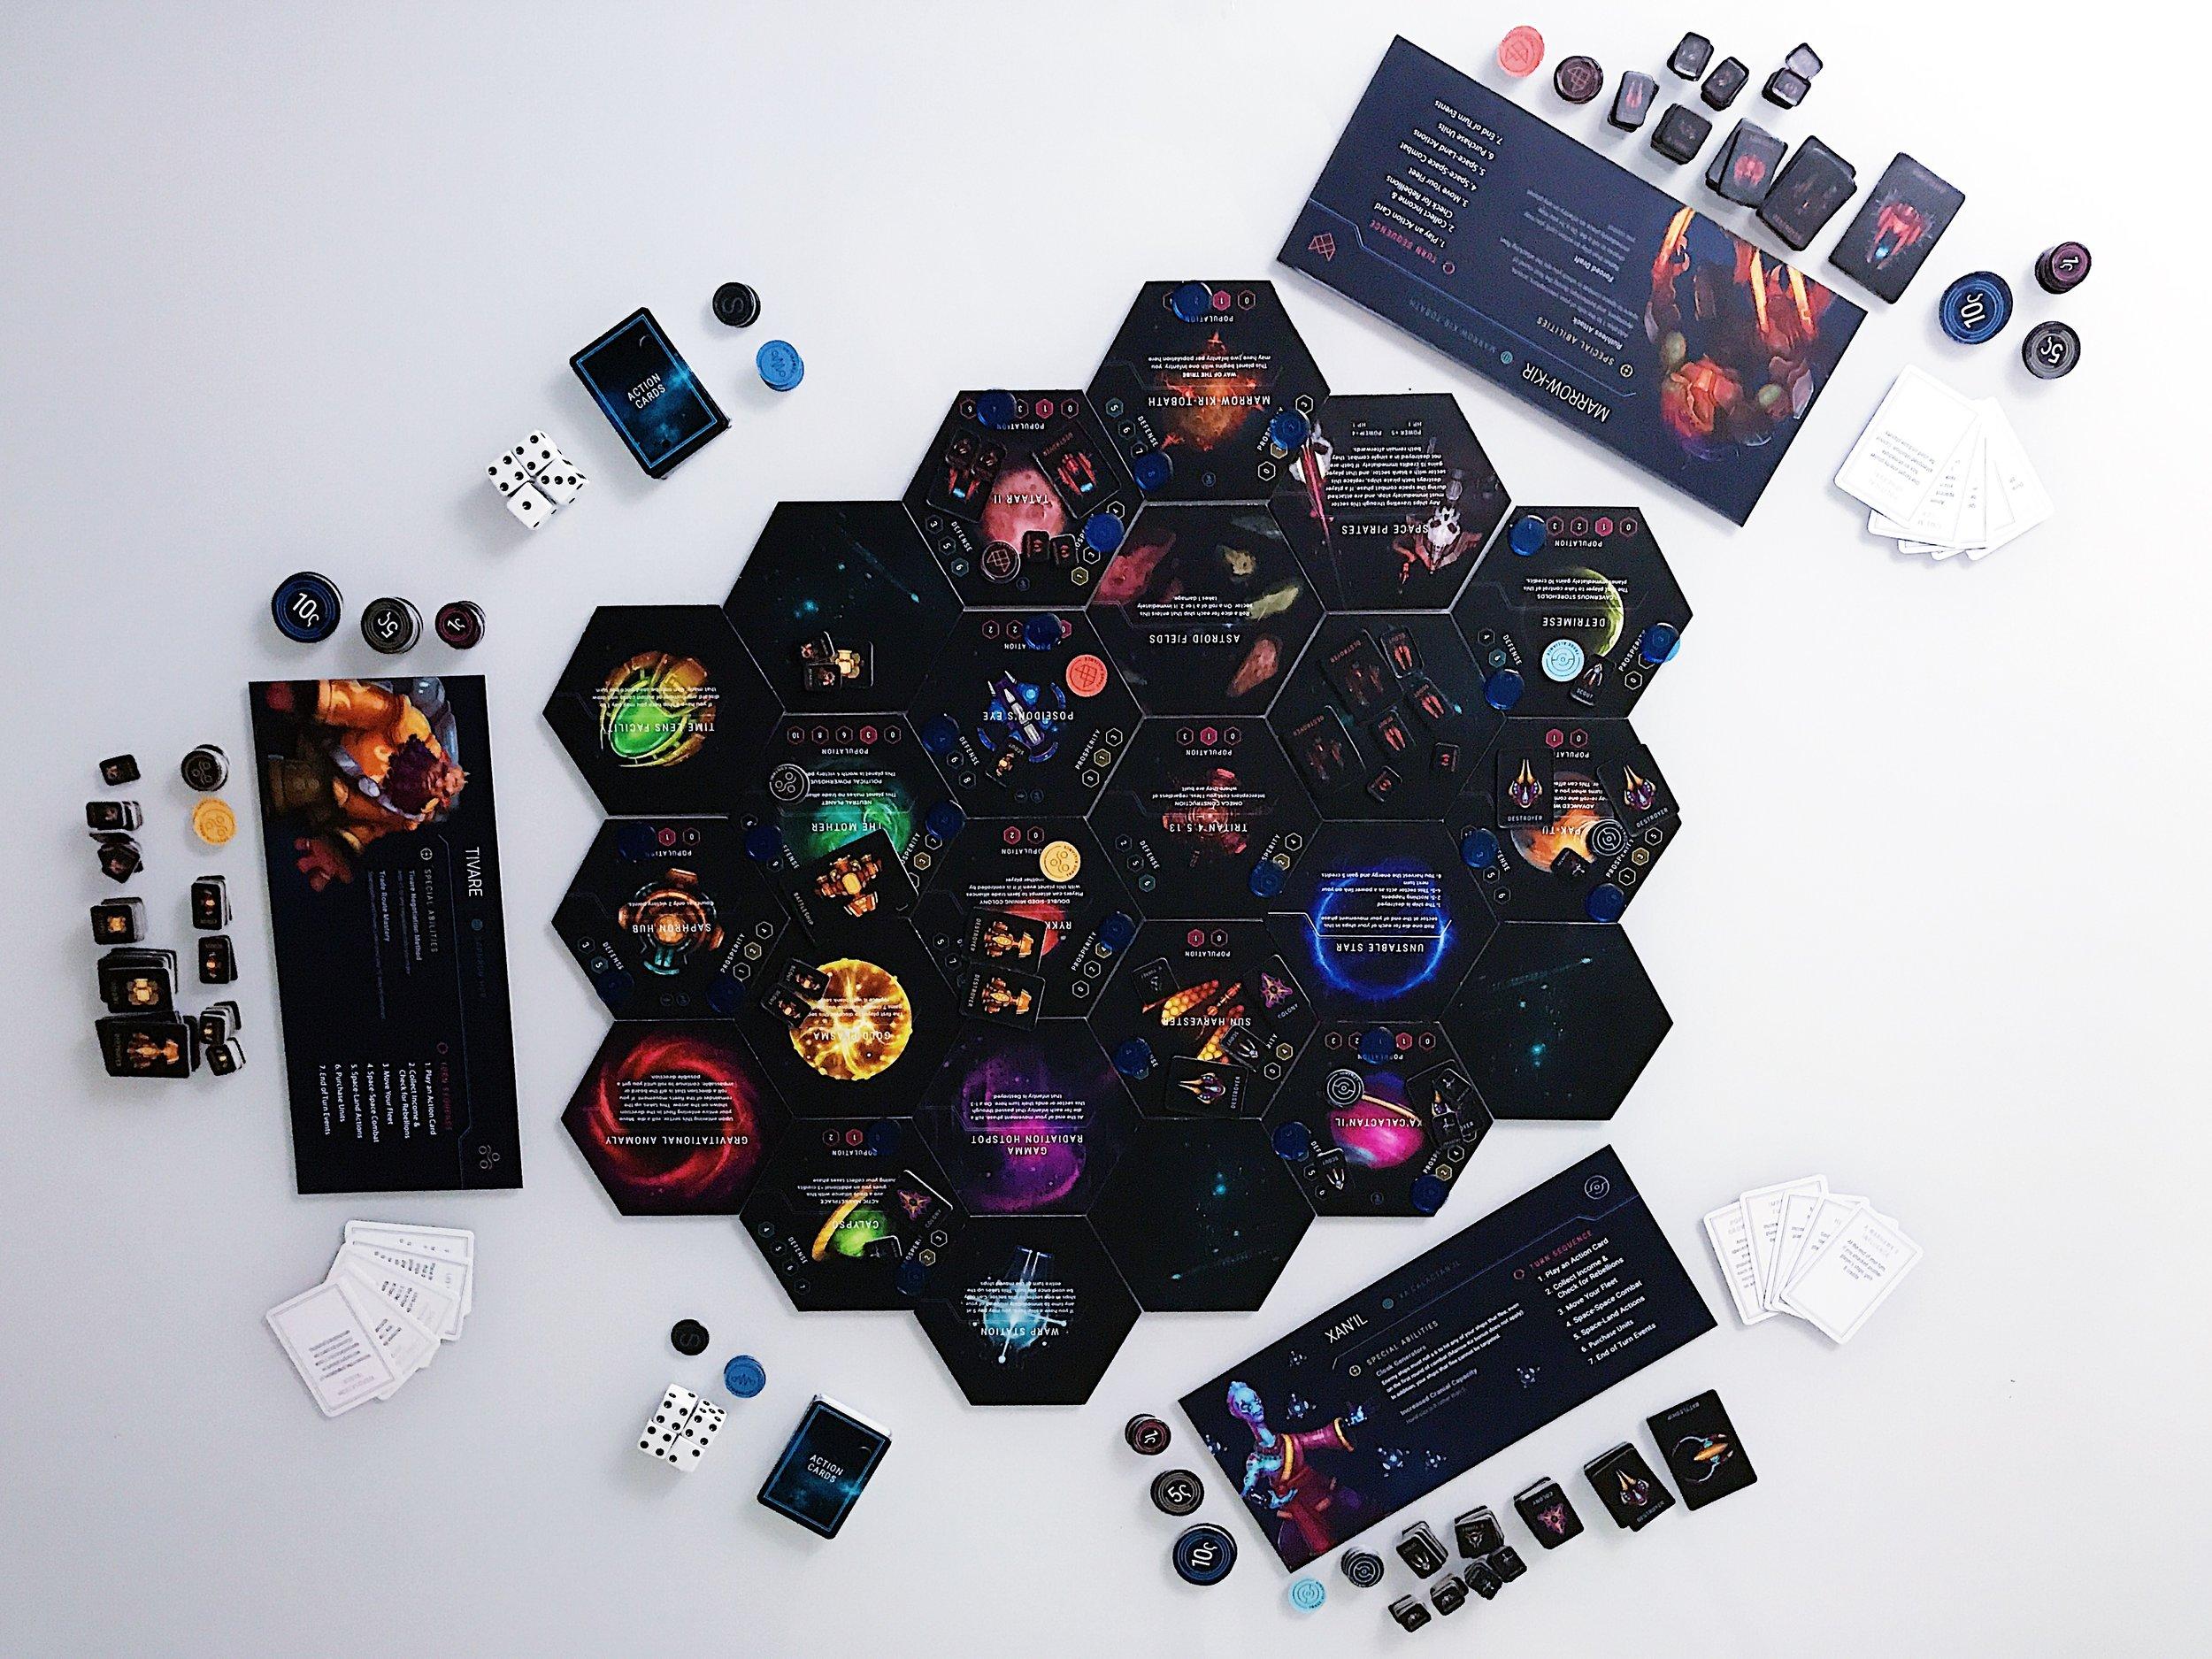 A three-player game setup